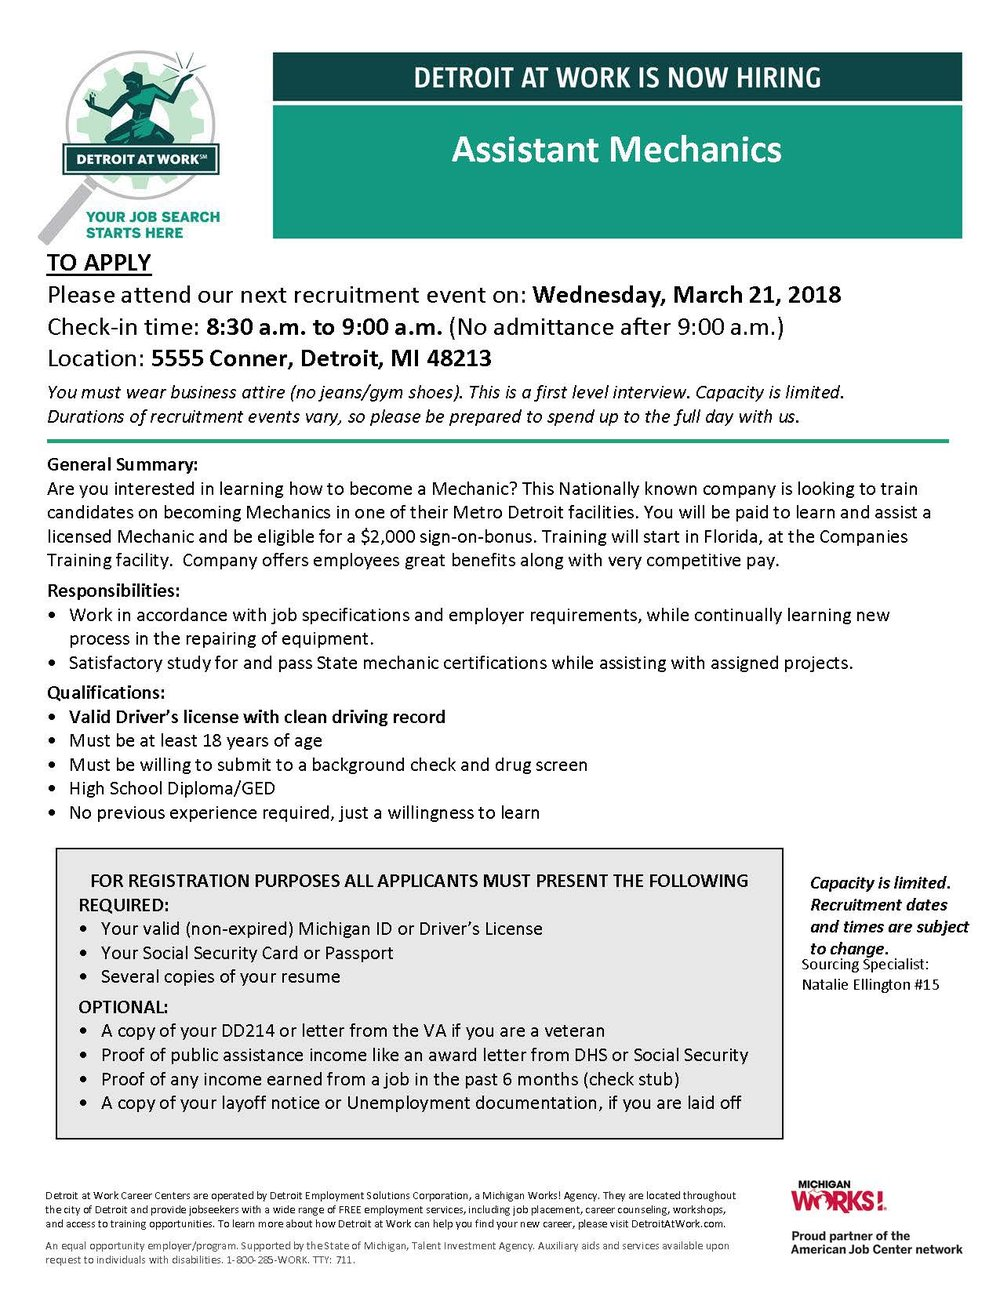 2018 03 21 Assistant MechanicTrainees 5555 Conner NE.JPG